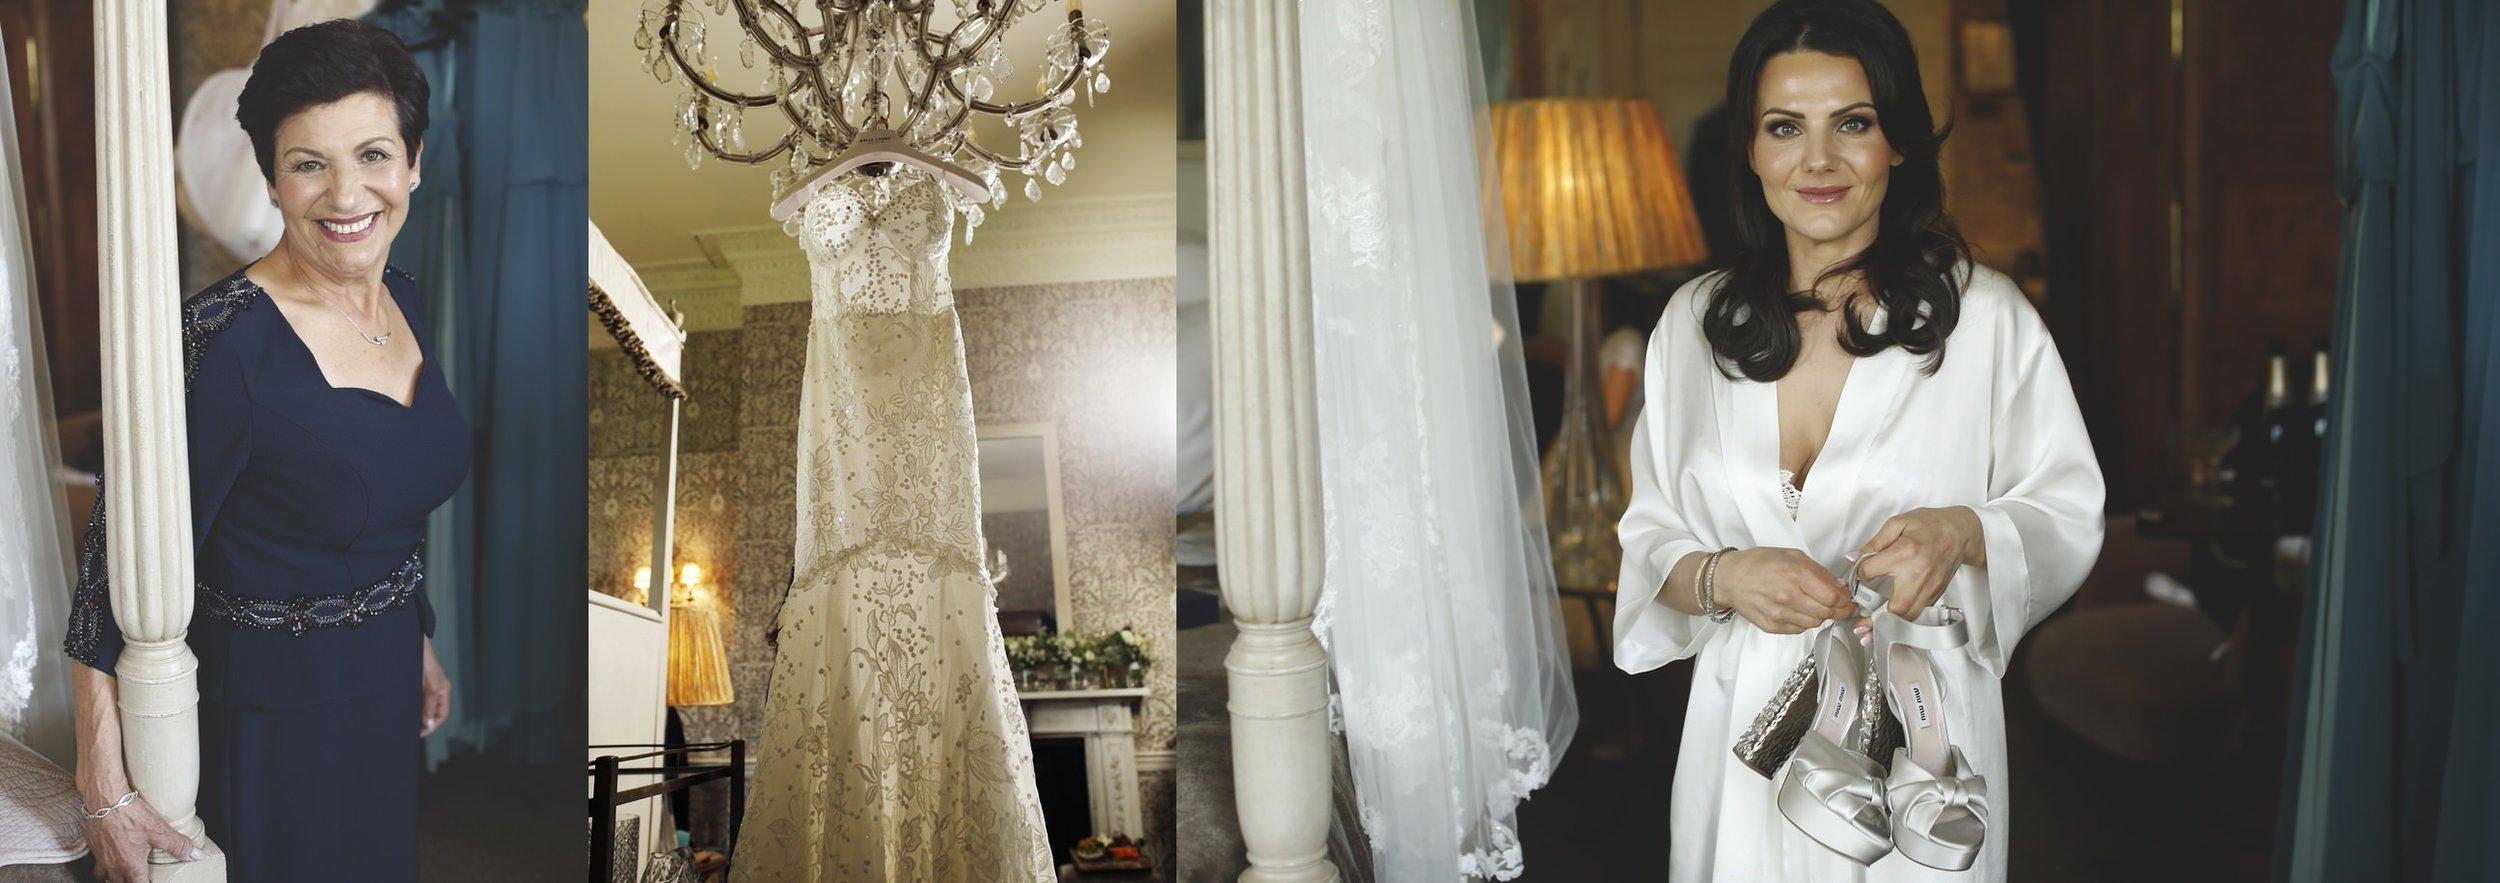 brettharkness-luxury-wedding-photographer-uk_0016.jpg